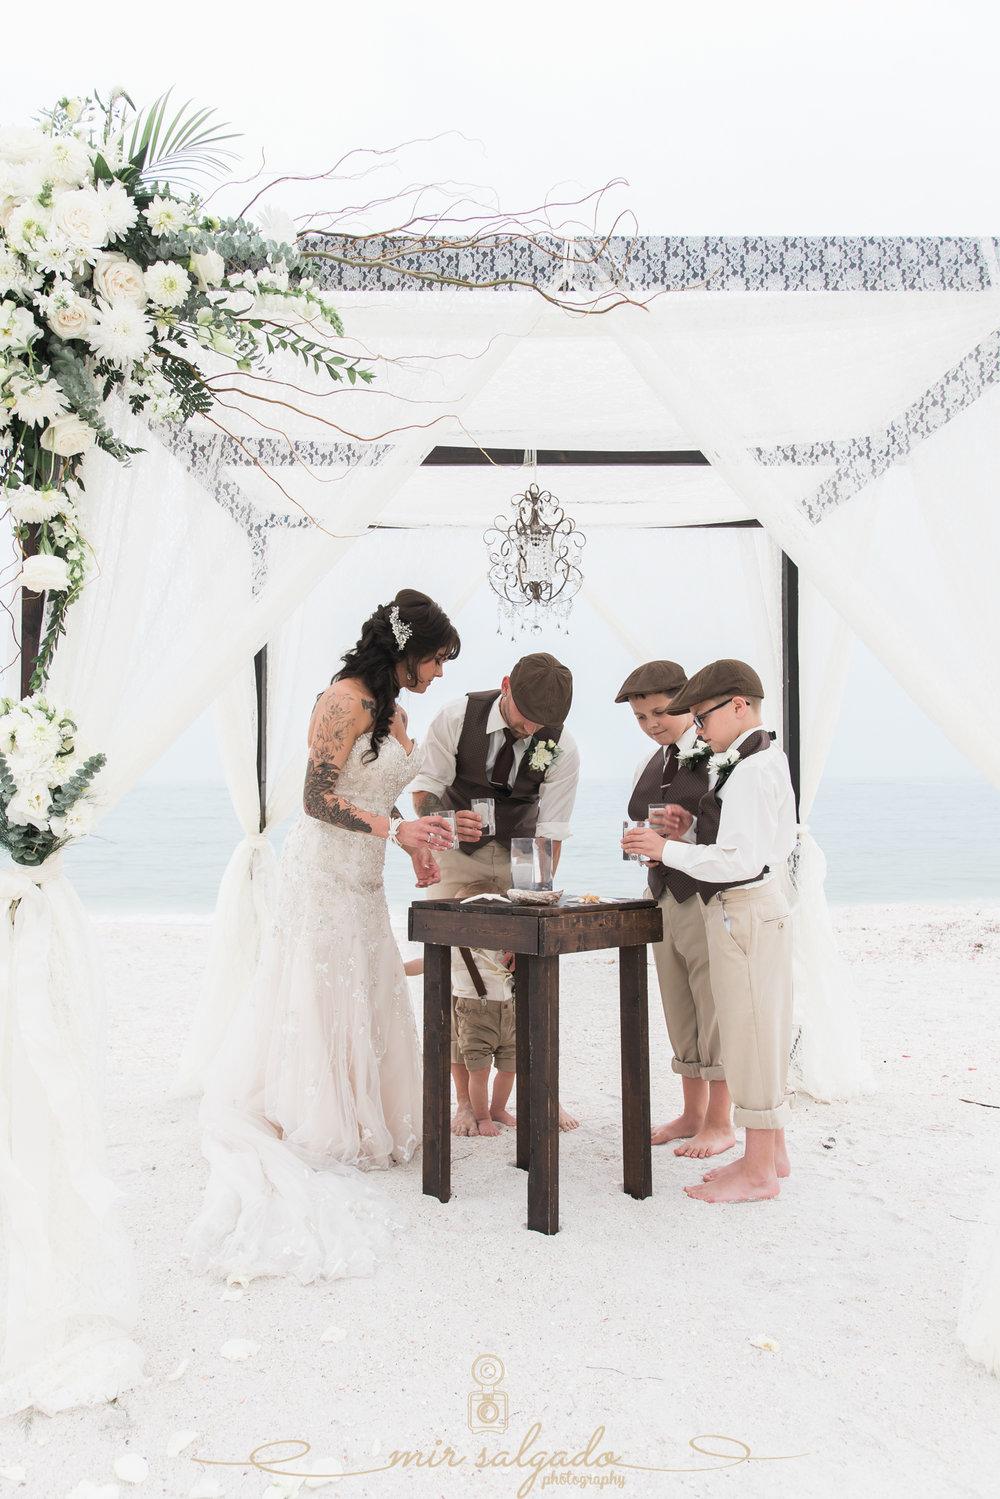 Sand-ceremony-photo, beach-wedding-ceremony